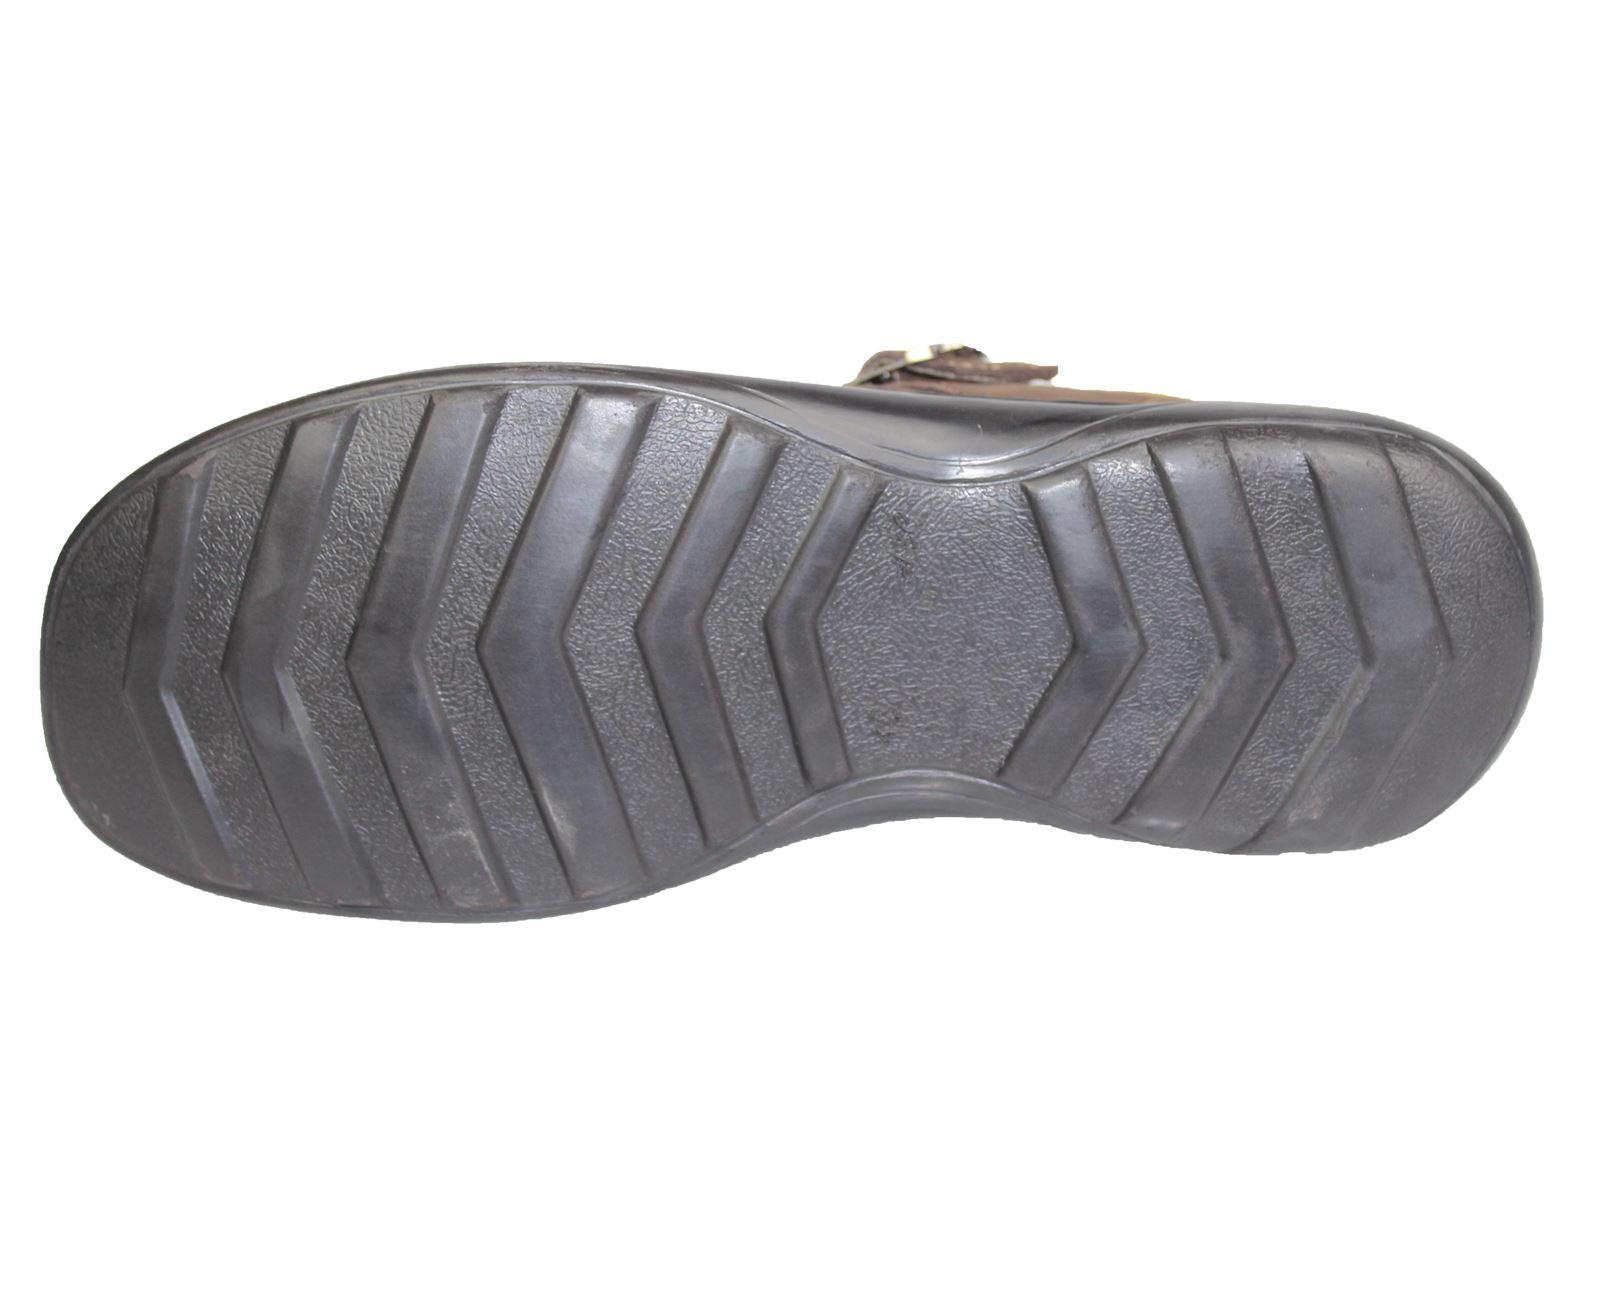 Mens-Buckle-Fastening-Sandals-Flat-Beach-Walking-Fashion-Casual-Summer-Slipper miniatura 15